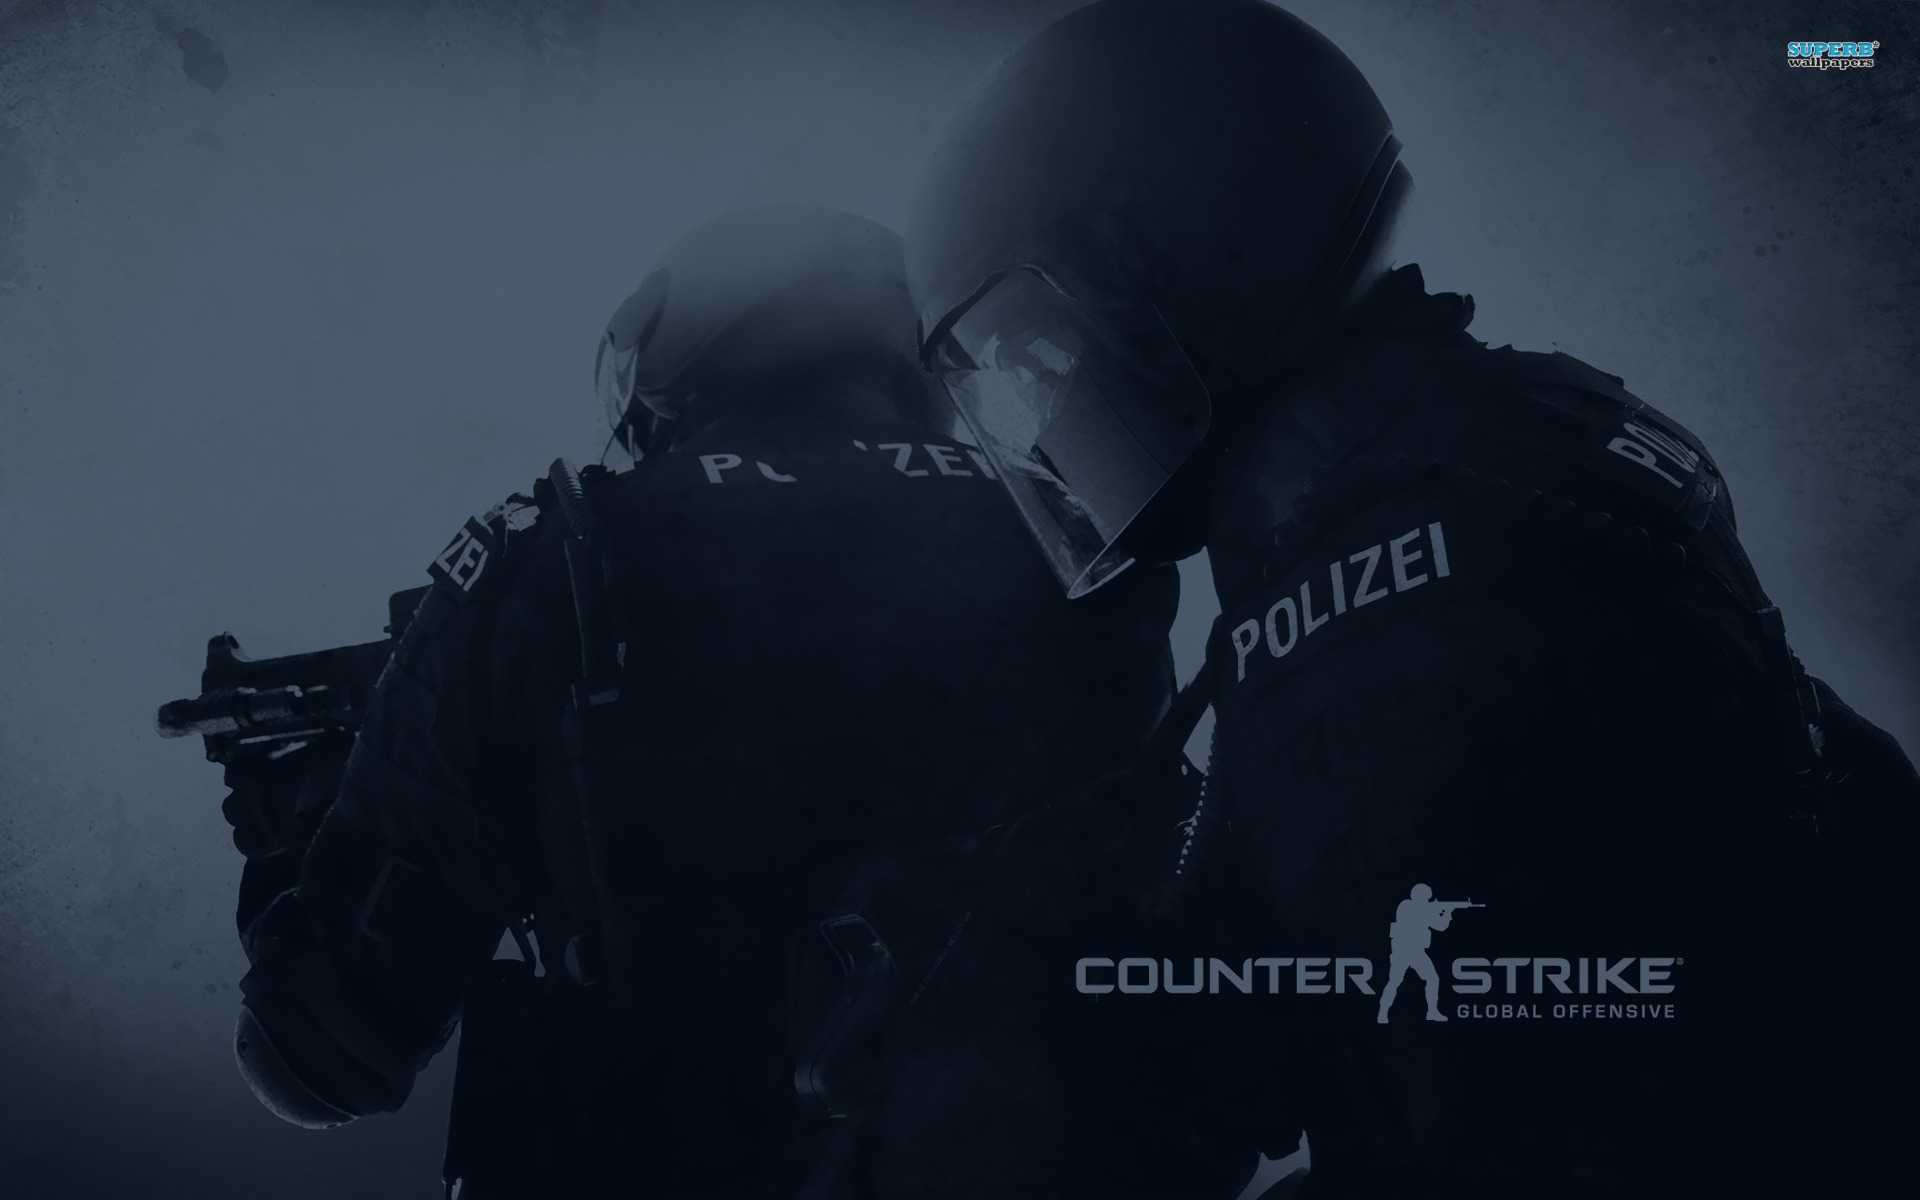 Counter Strike Global Offensive Wallpaper 2 1920x1200